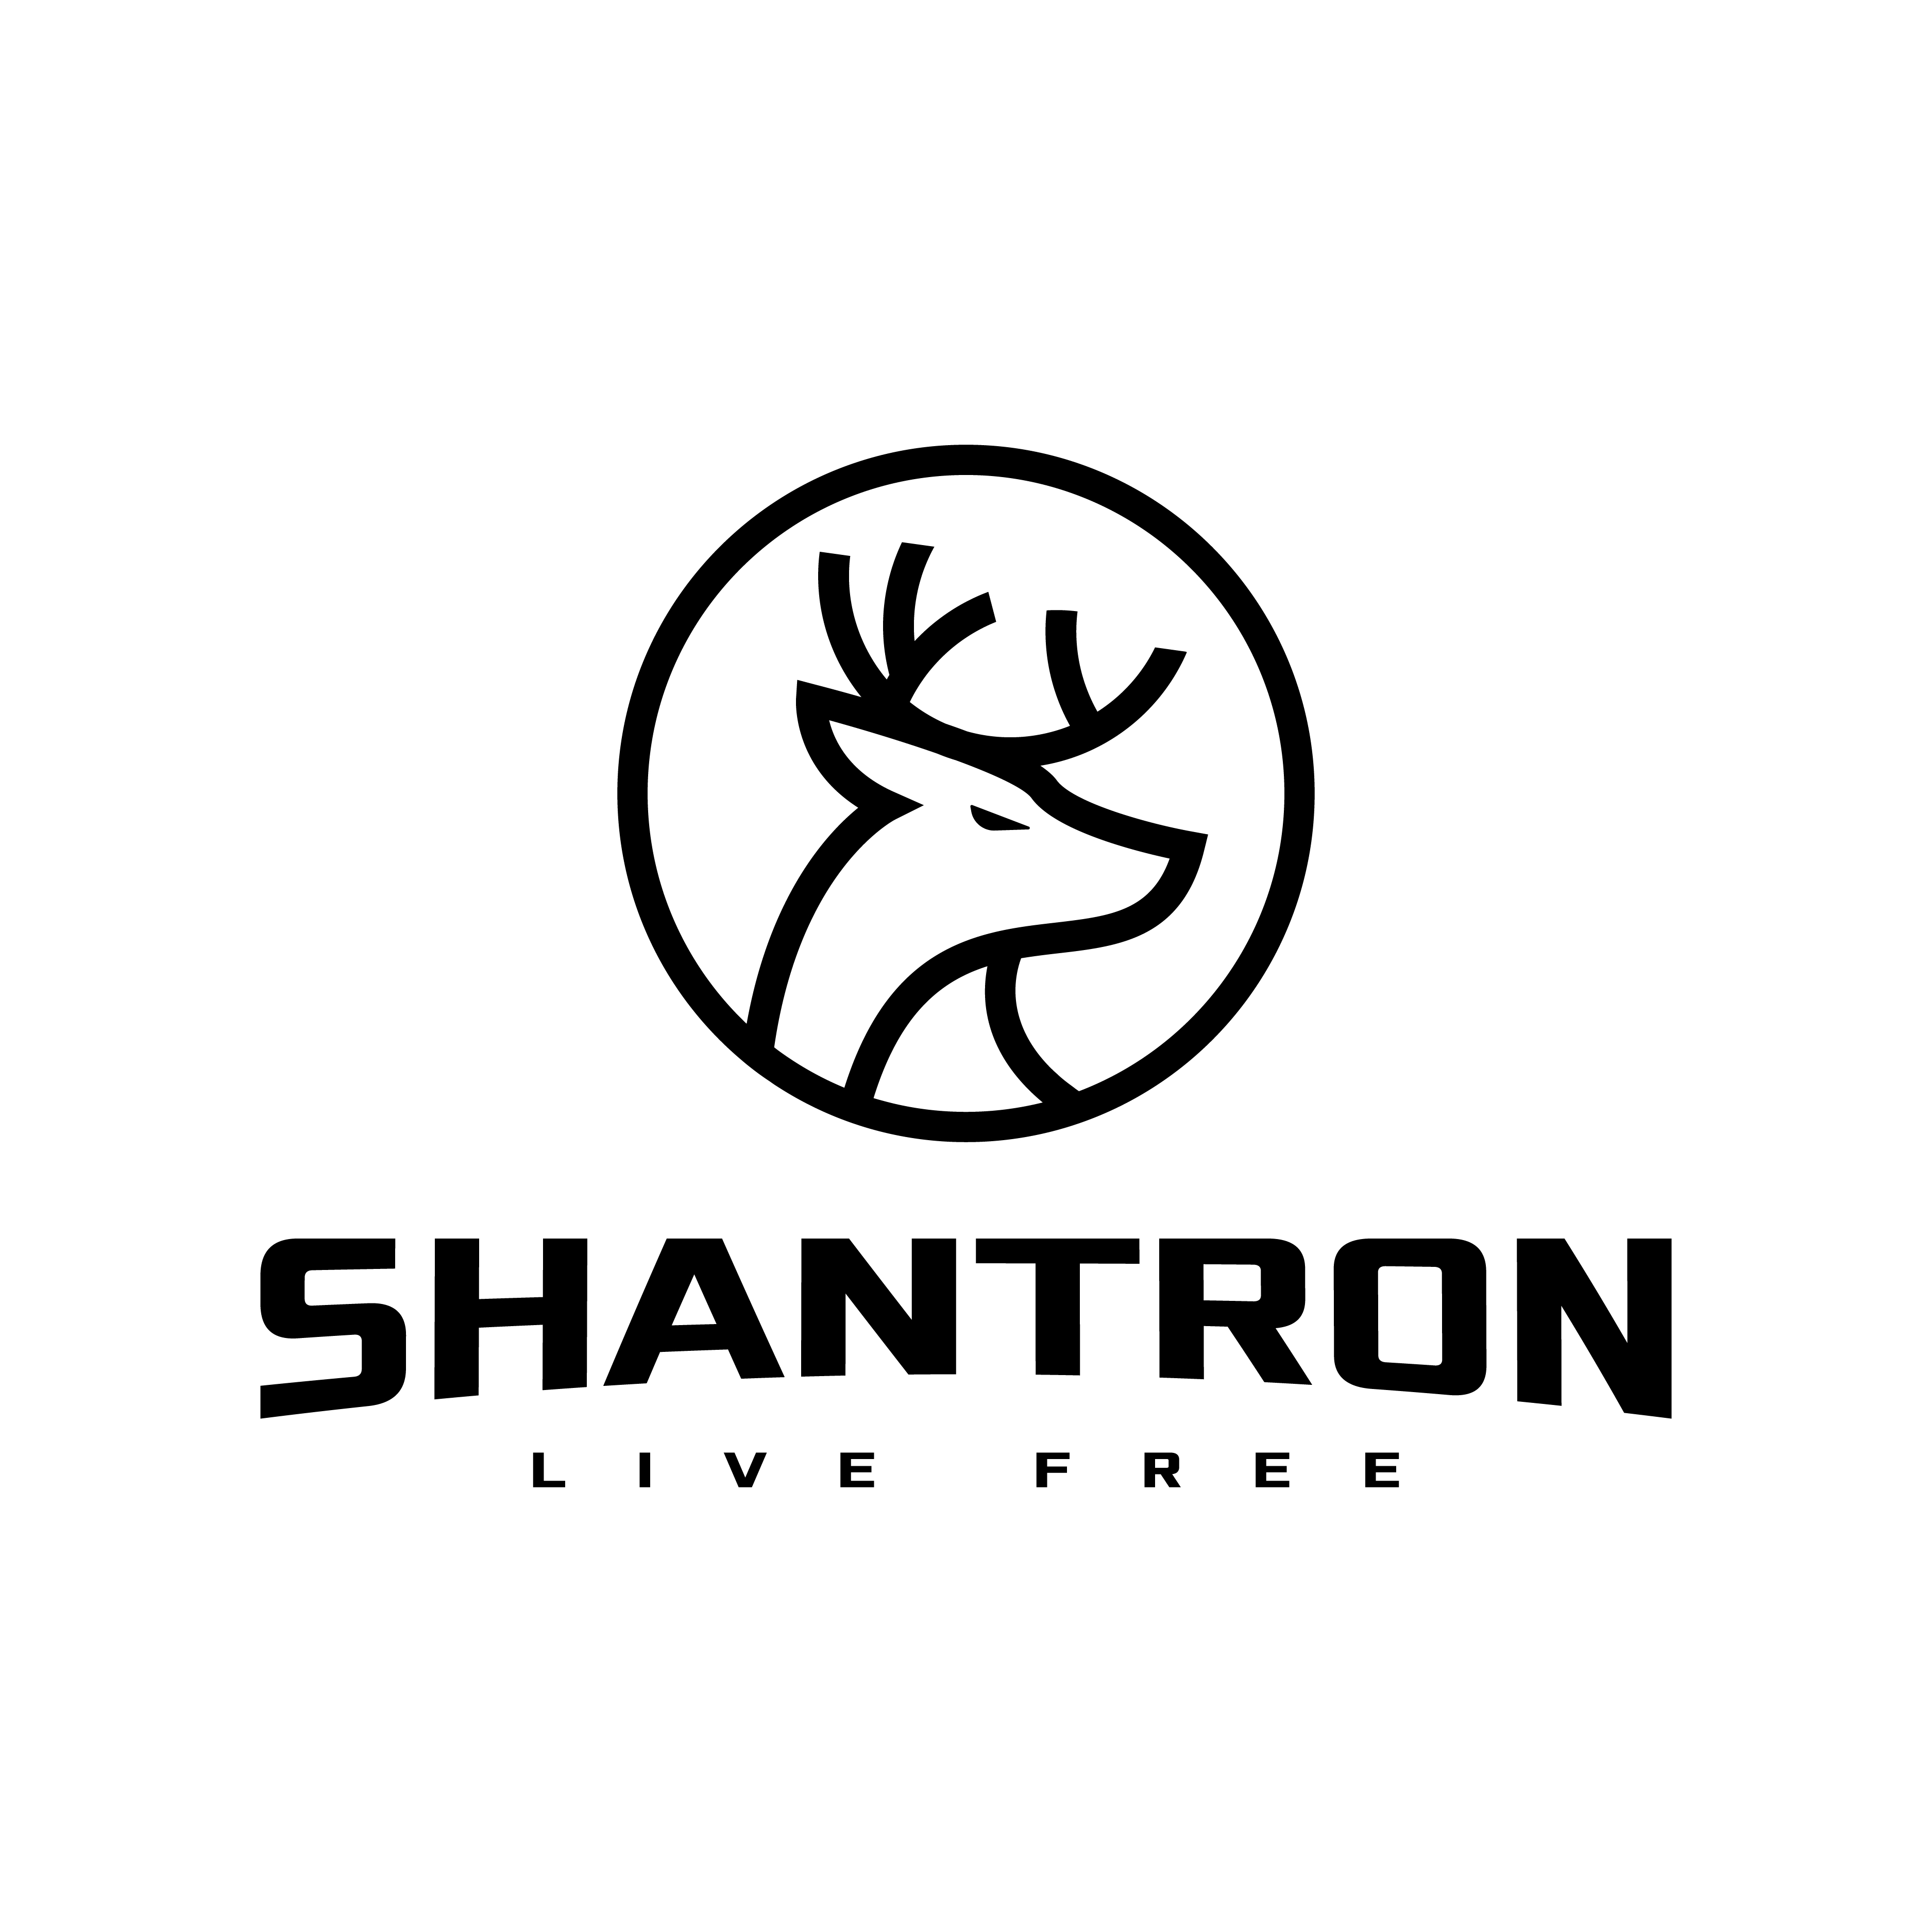 SHANTRON logo design by logo designer Radu Moraru